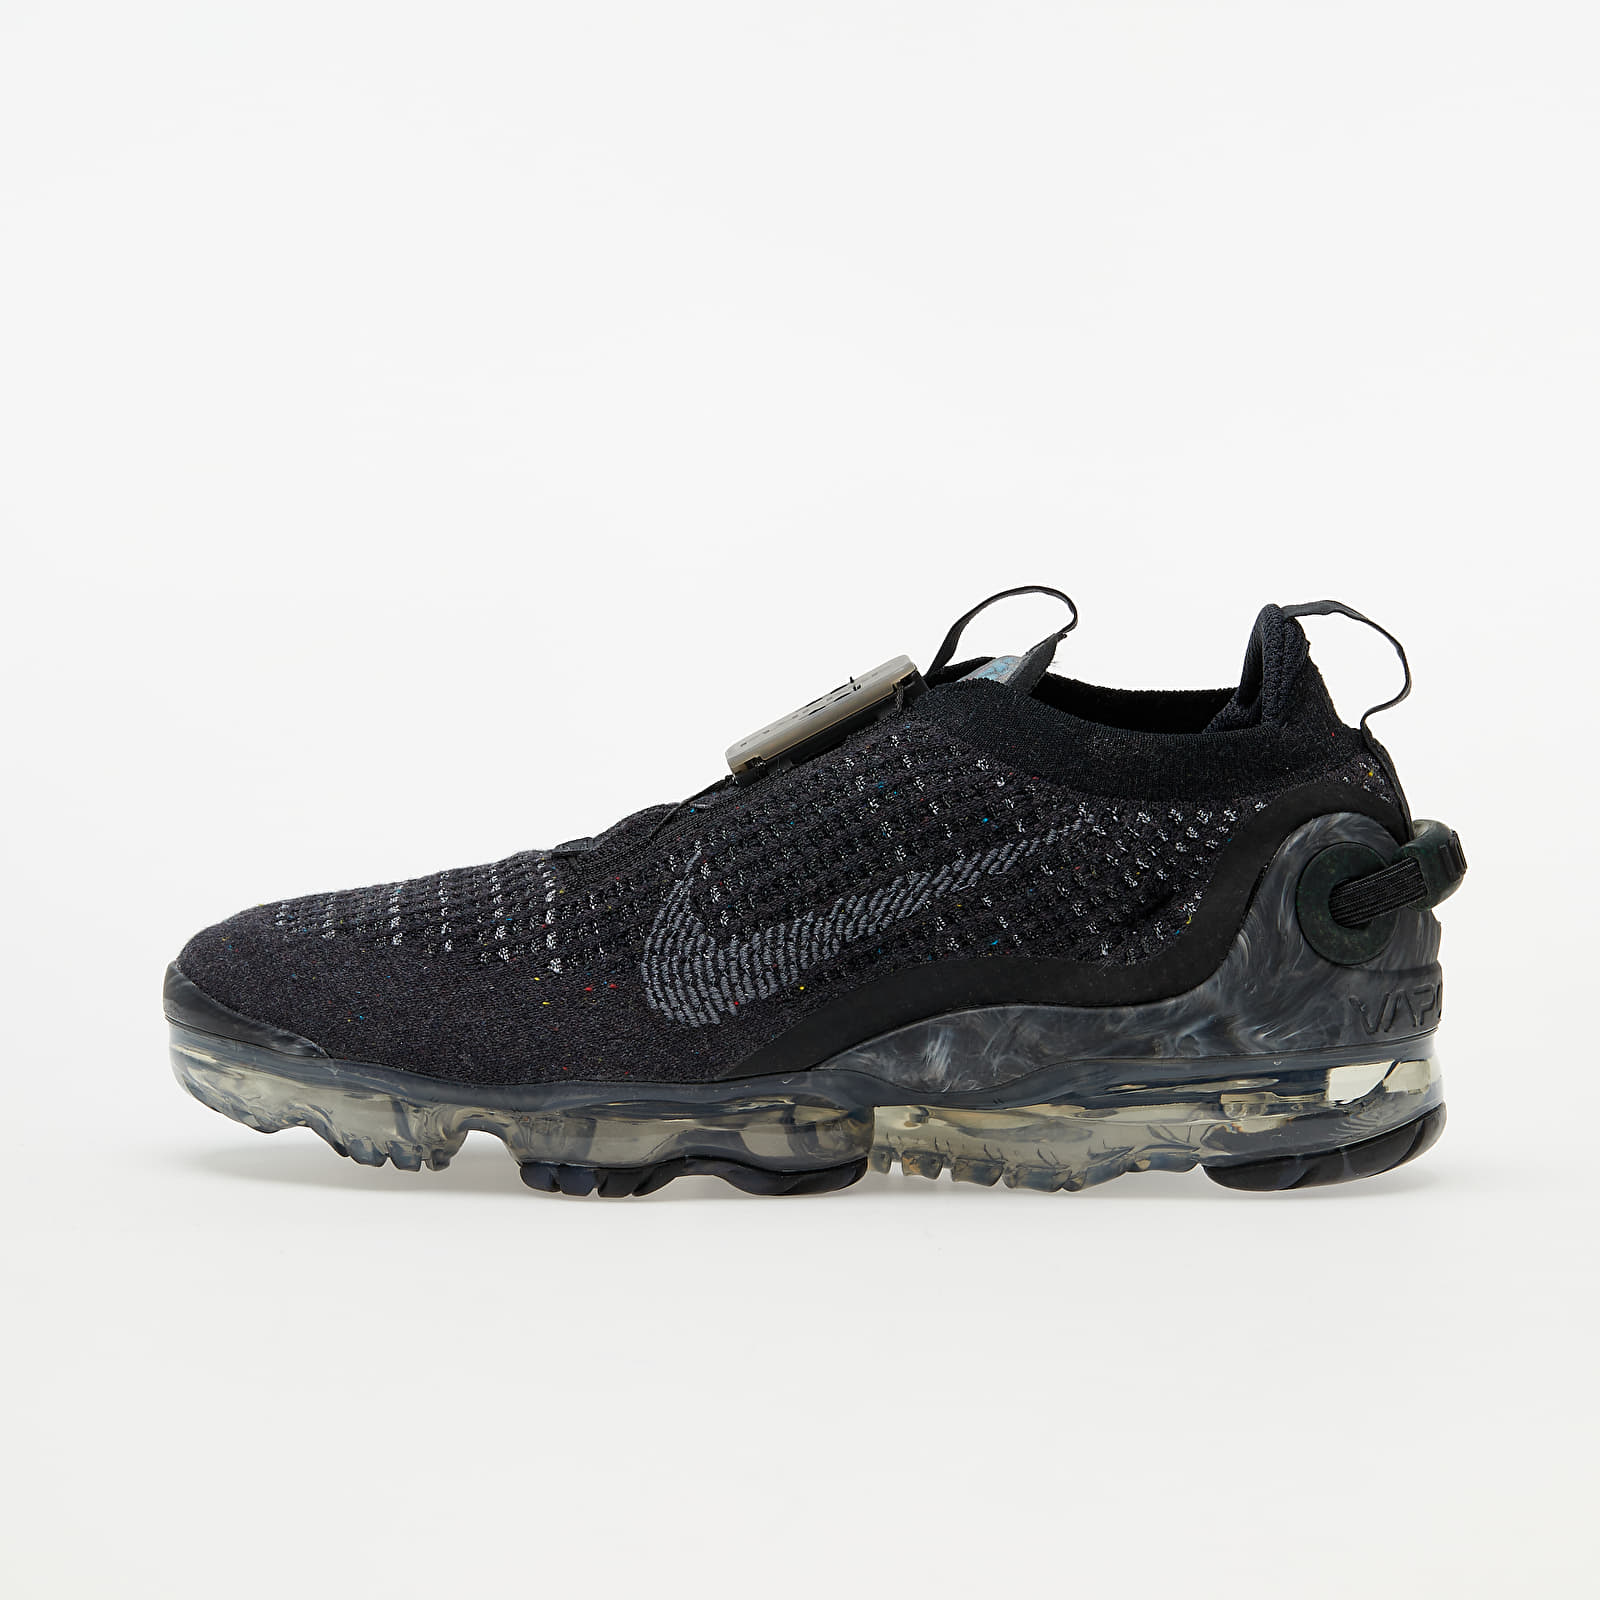 Nike Air Vapormax 2020 FK Black/ Dark Grey-Black EUR 41